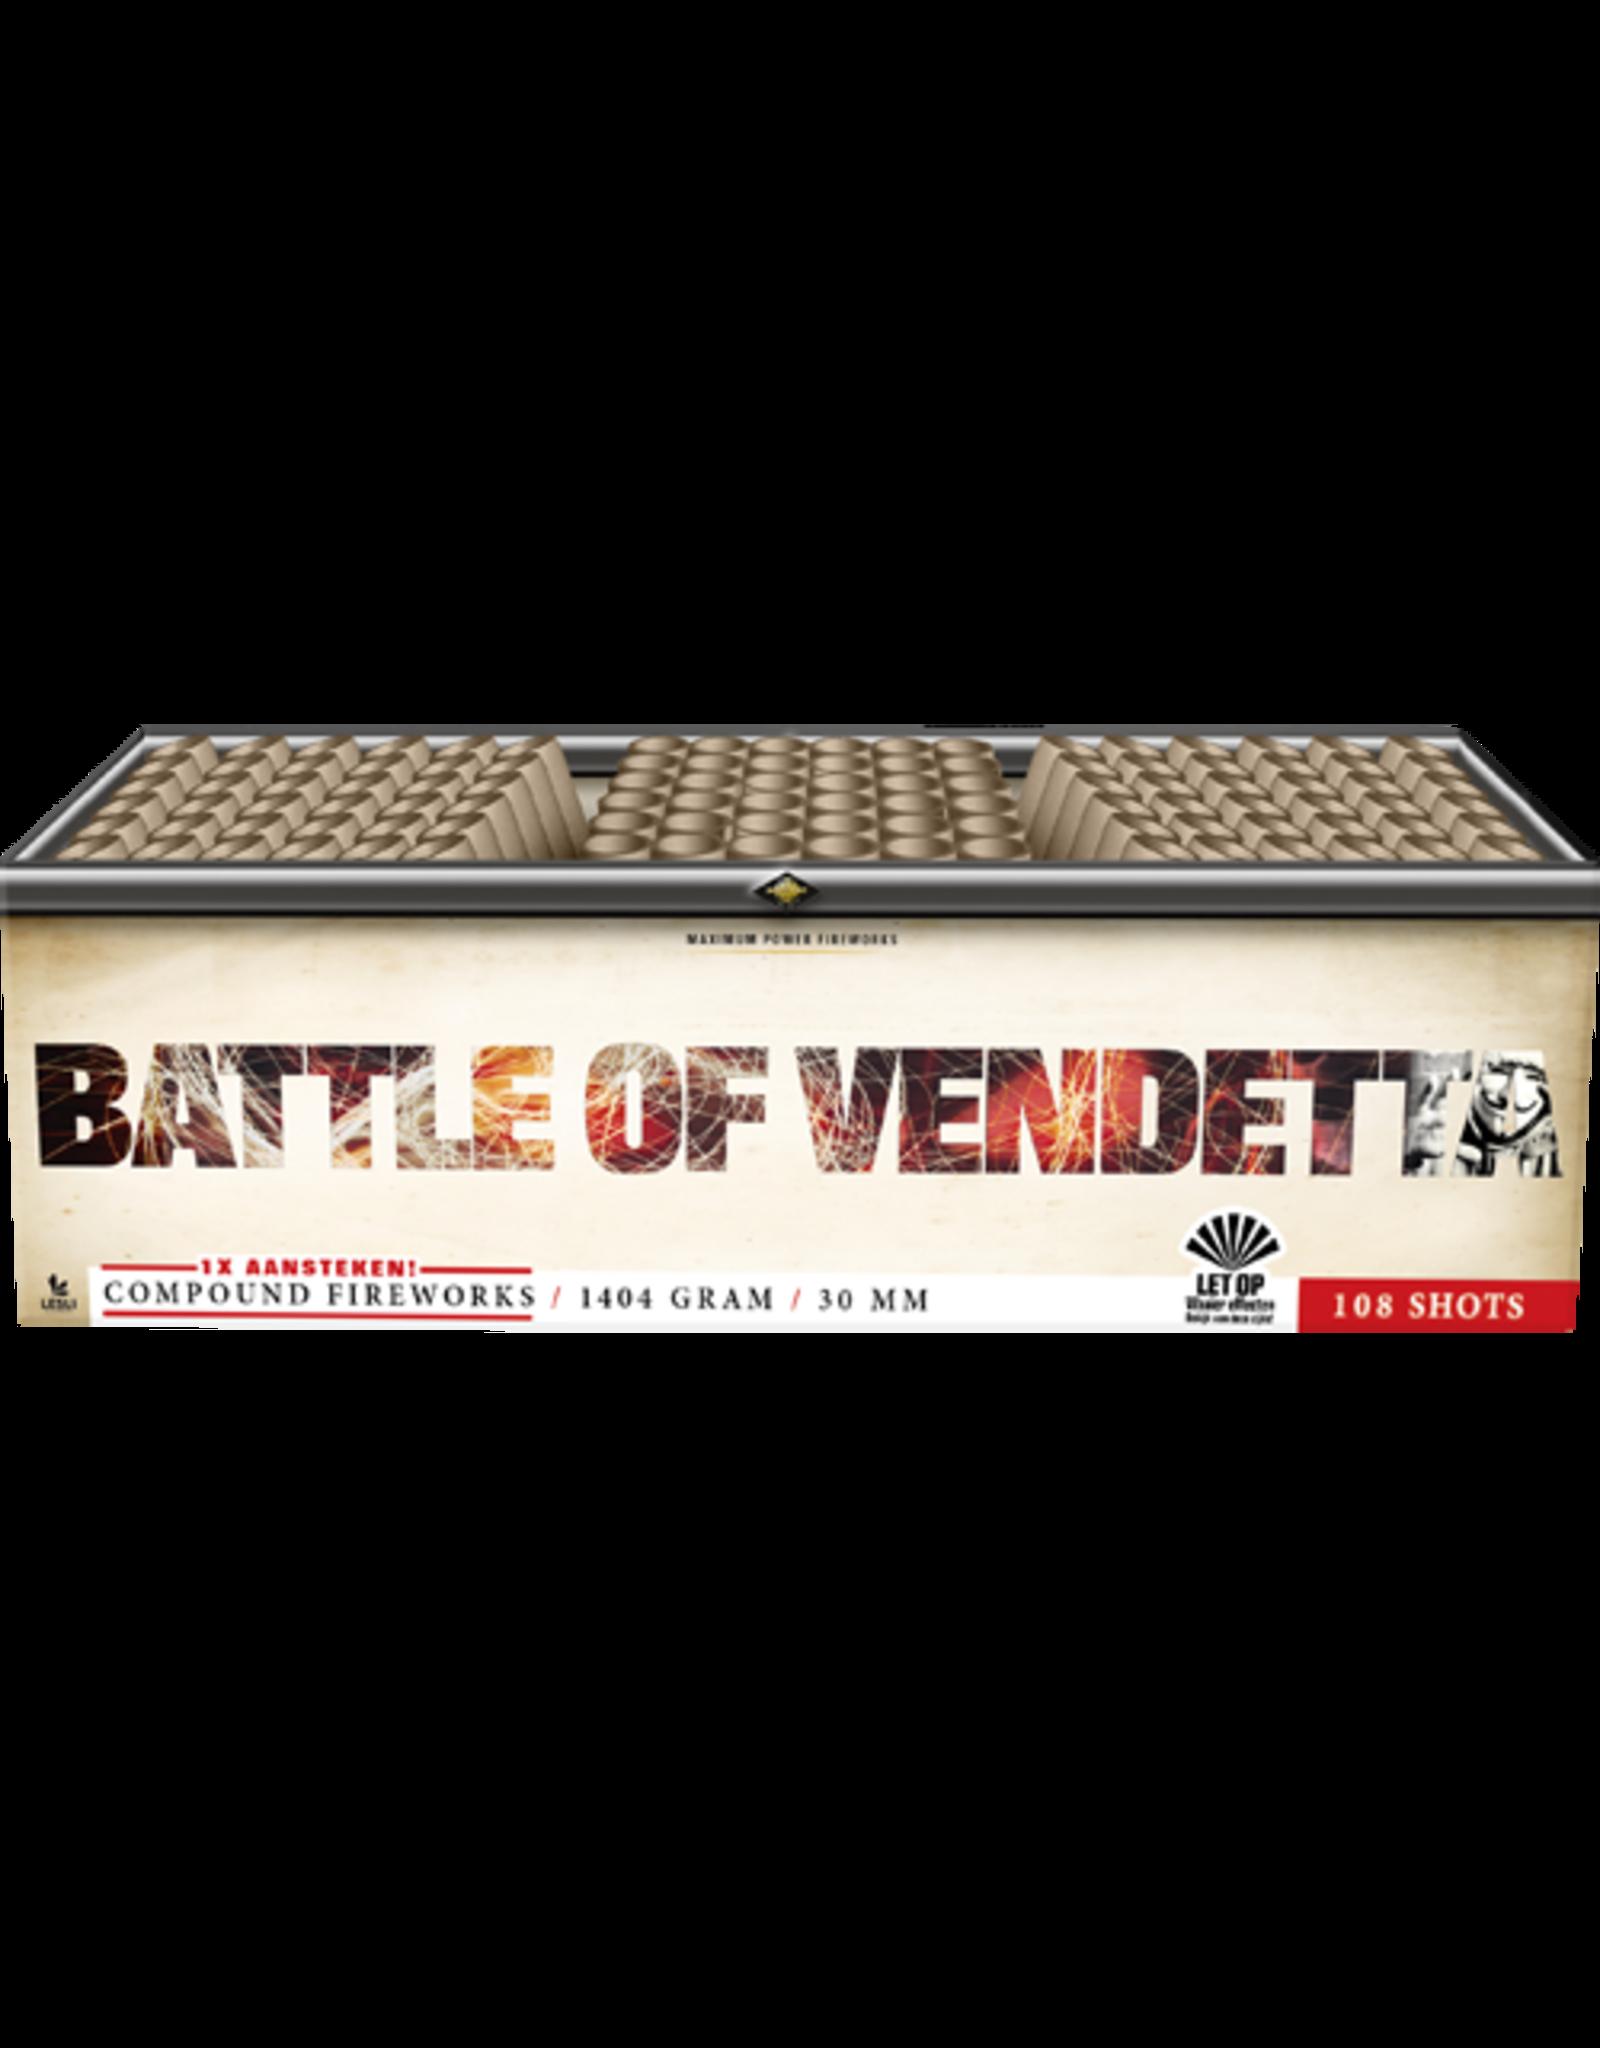 Lesli Vuurwerk Battle Of Vendetta 108 shots